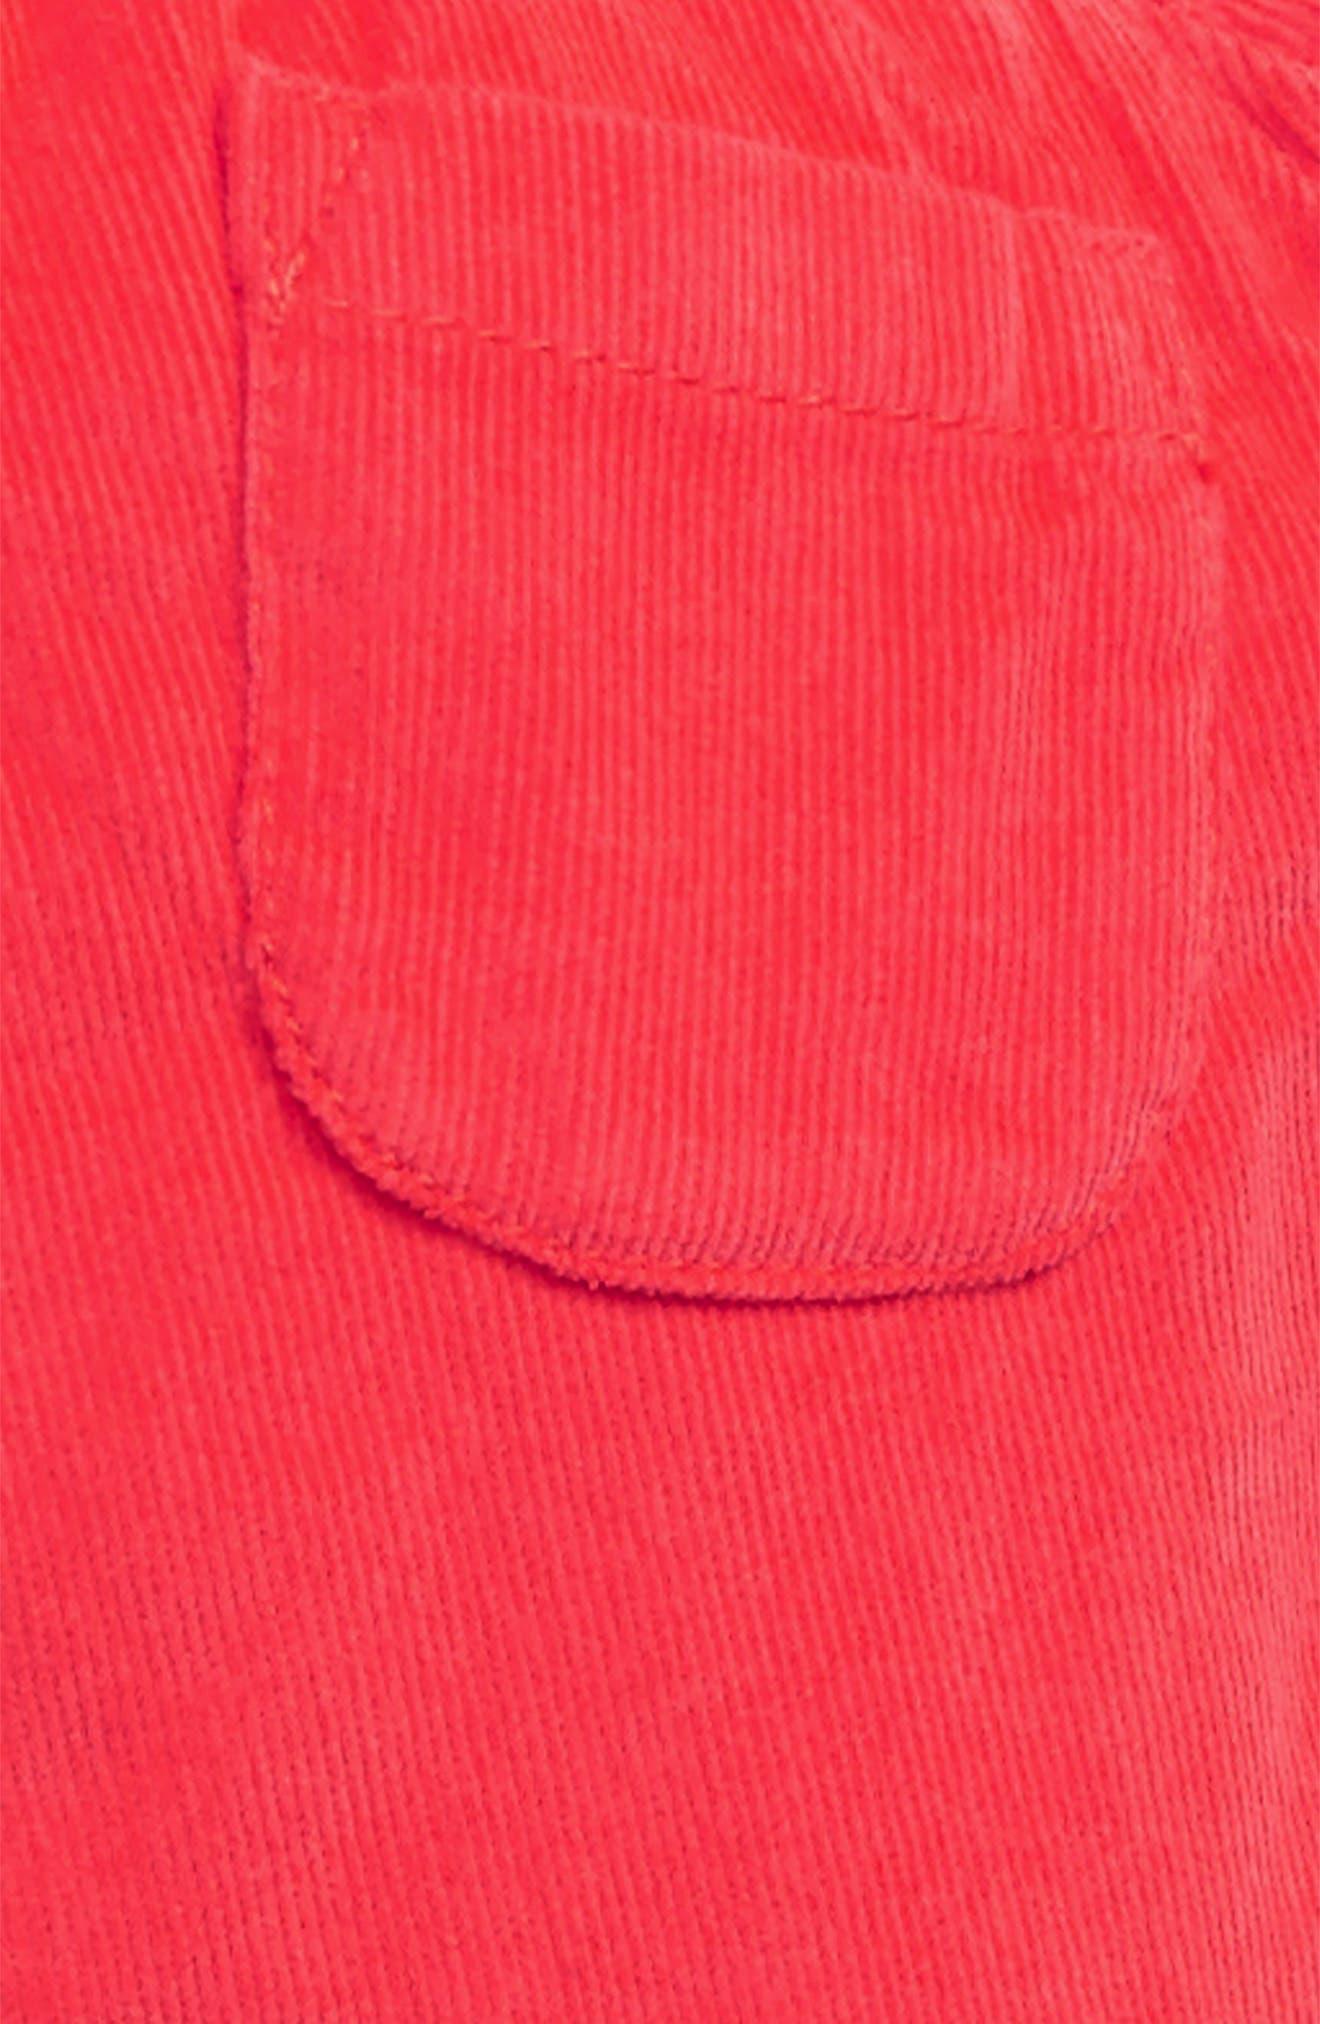 Alternate Image 3  - Mini Boden Corduroy Pants (Baby Girls & Toddler Girls)